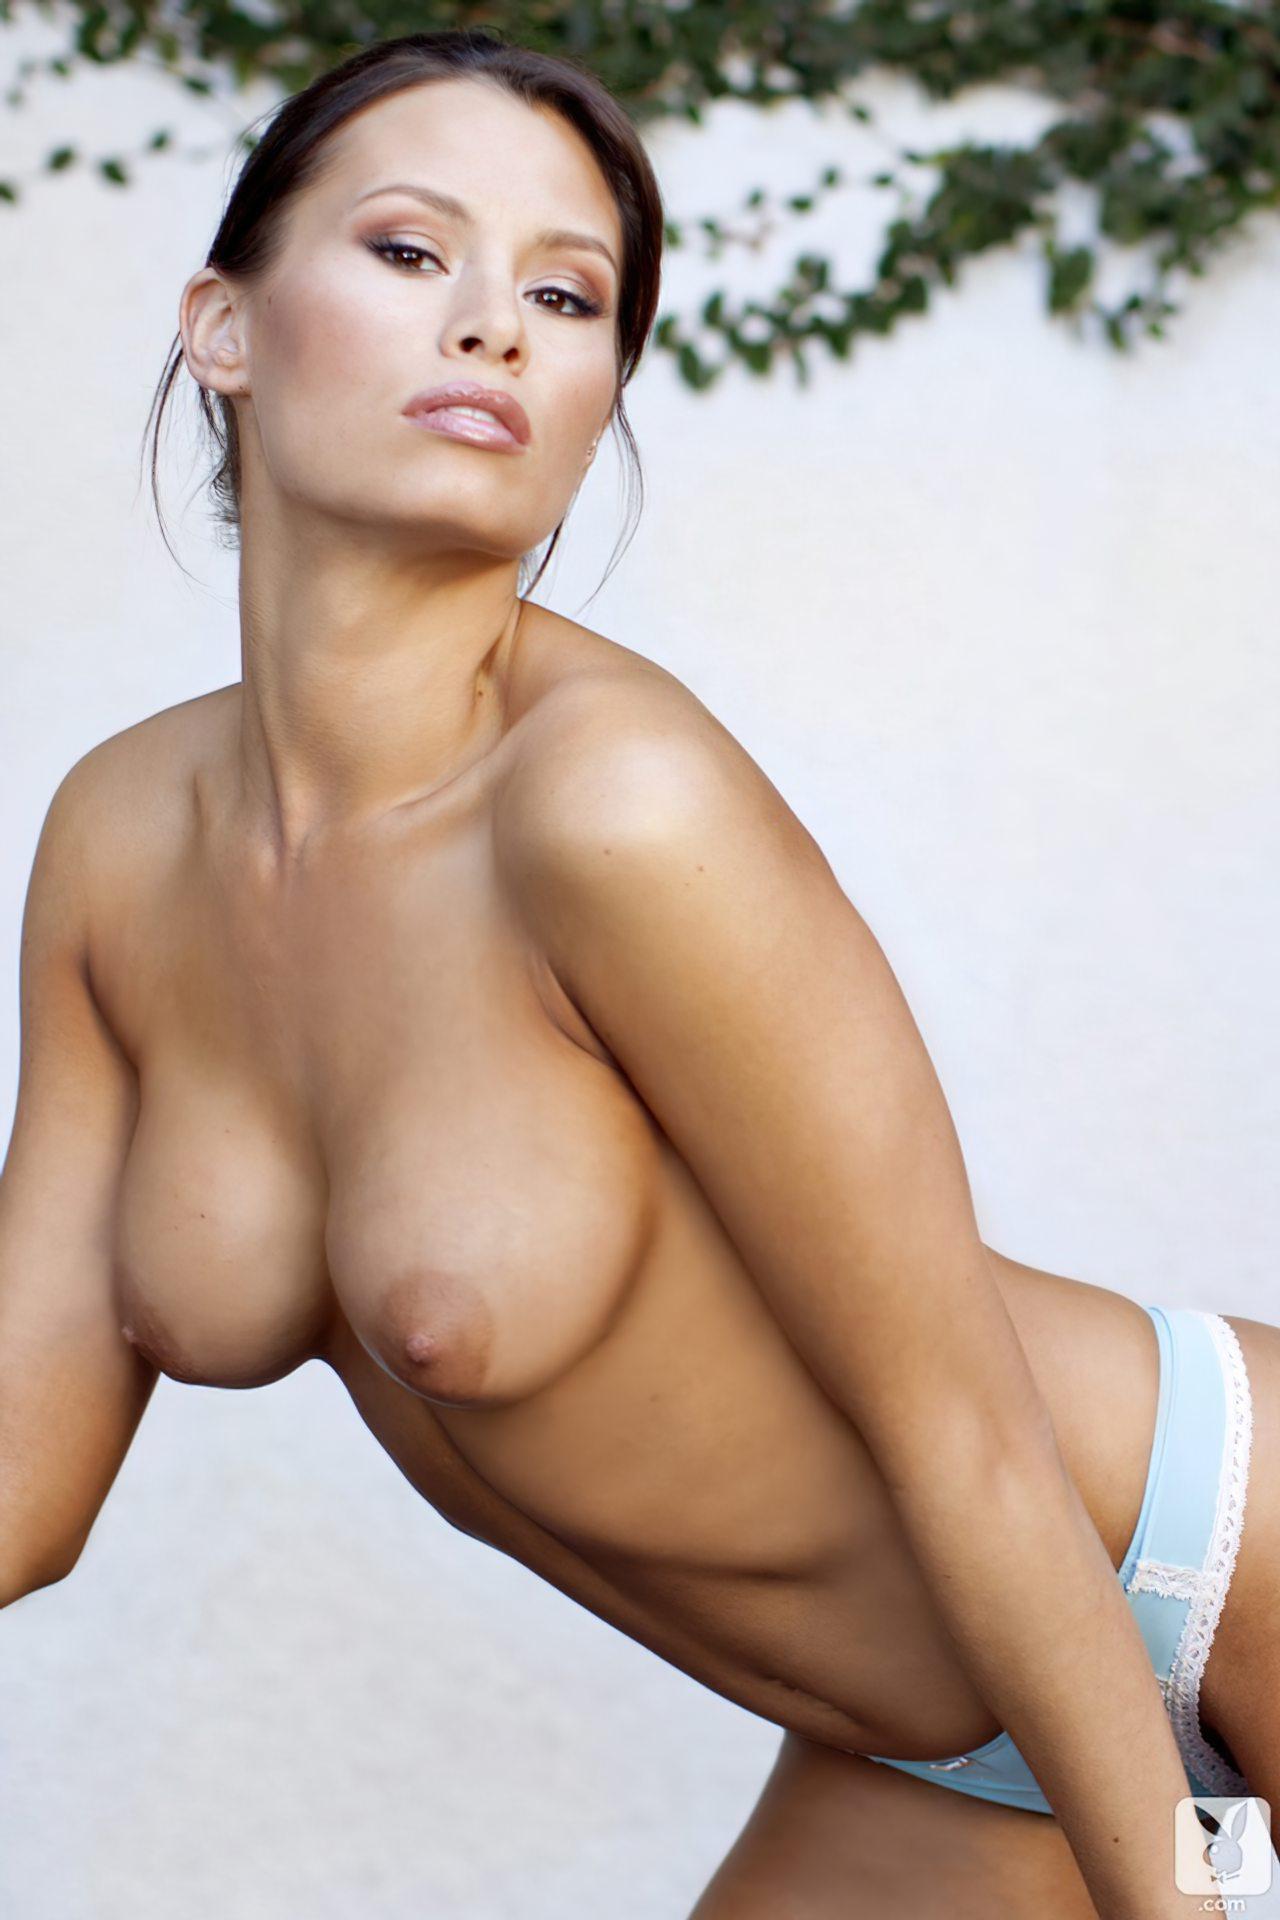 Bonita Sedutora (26)